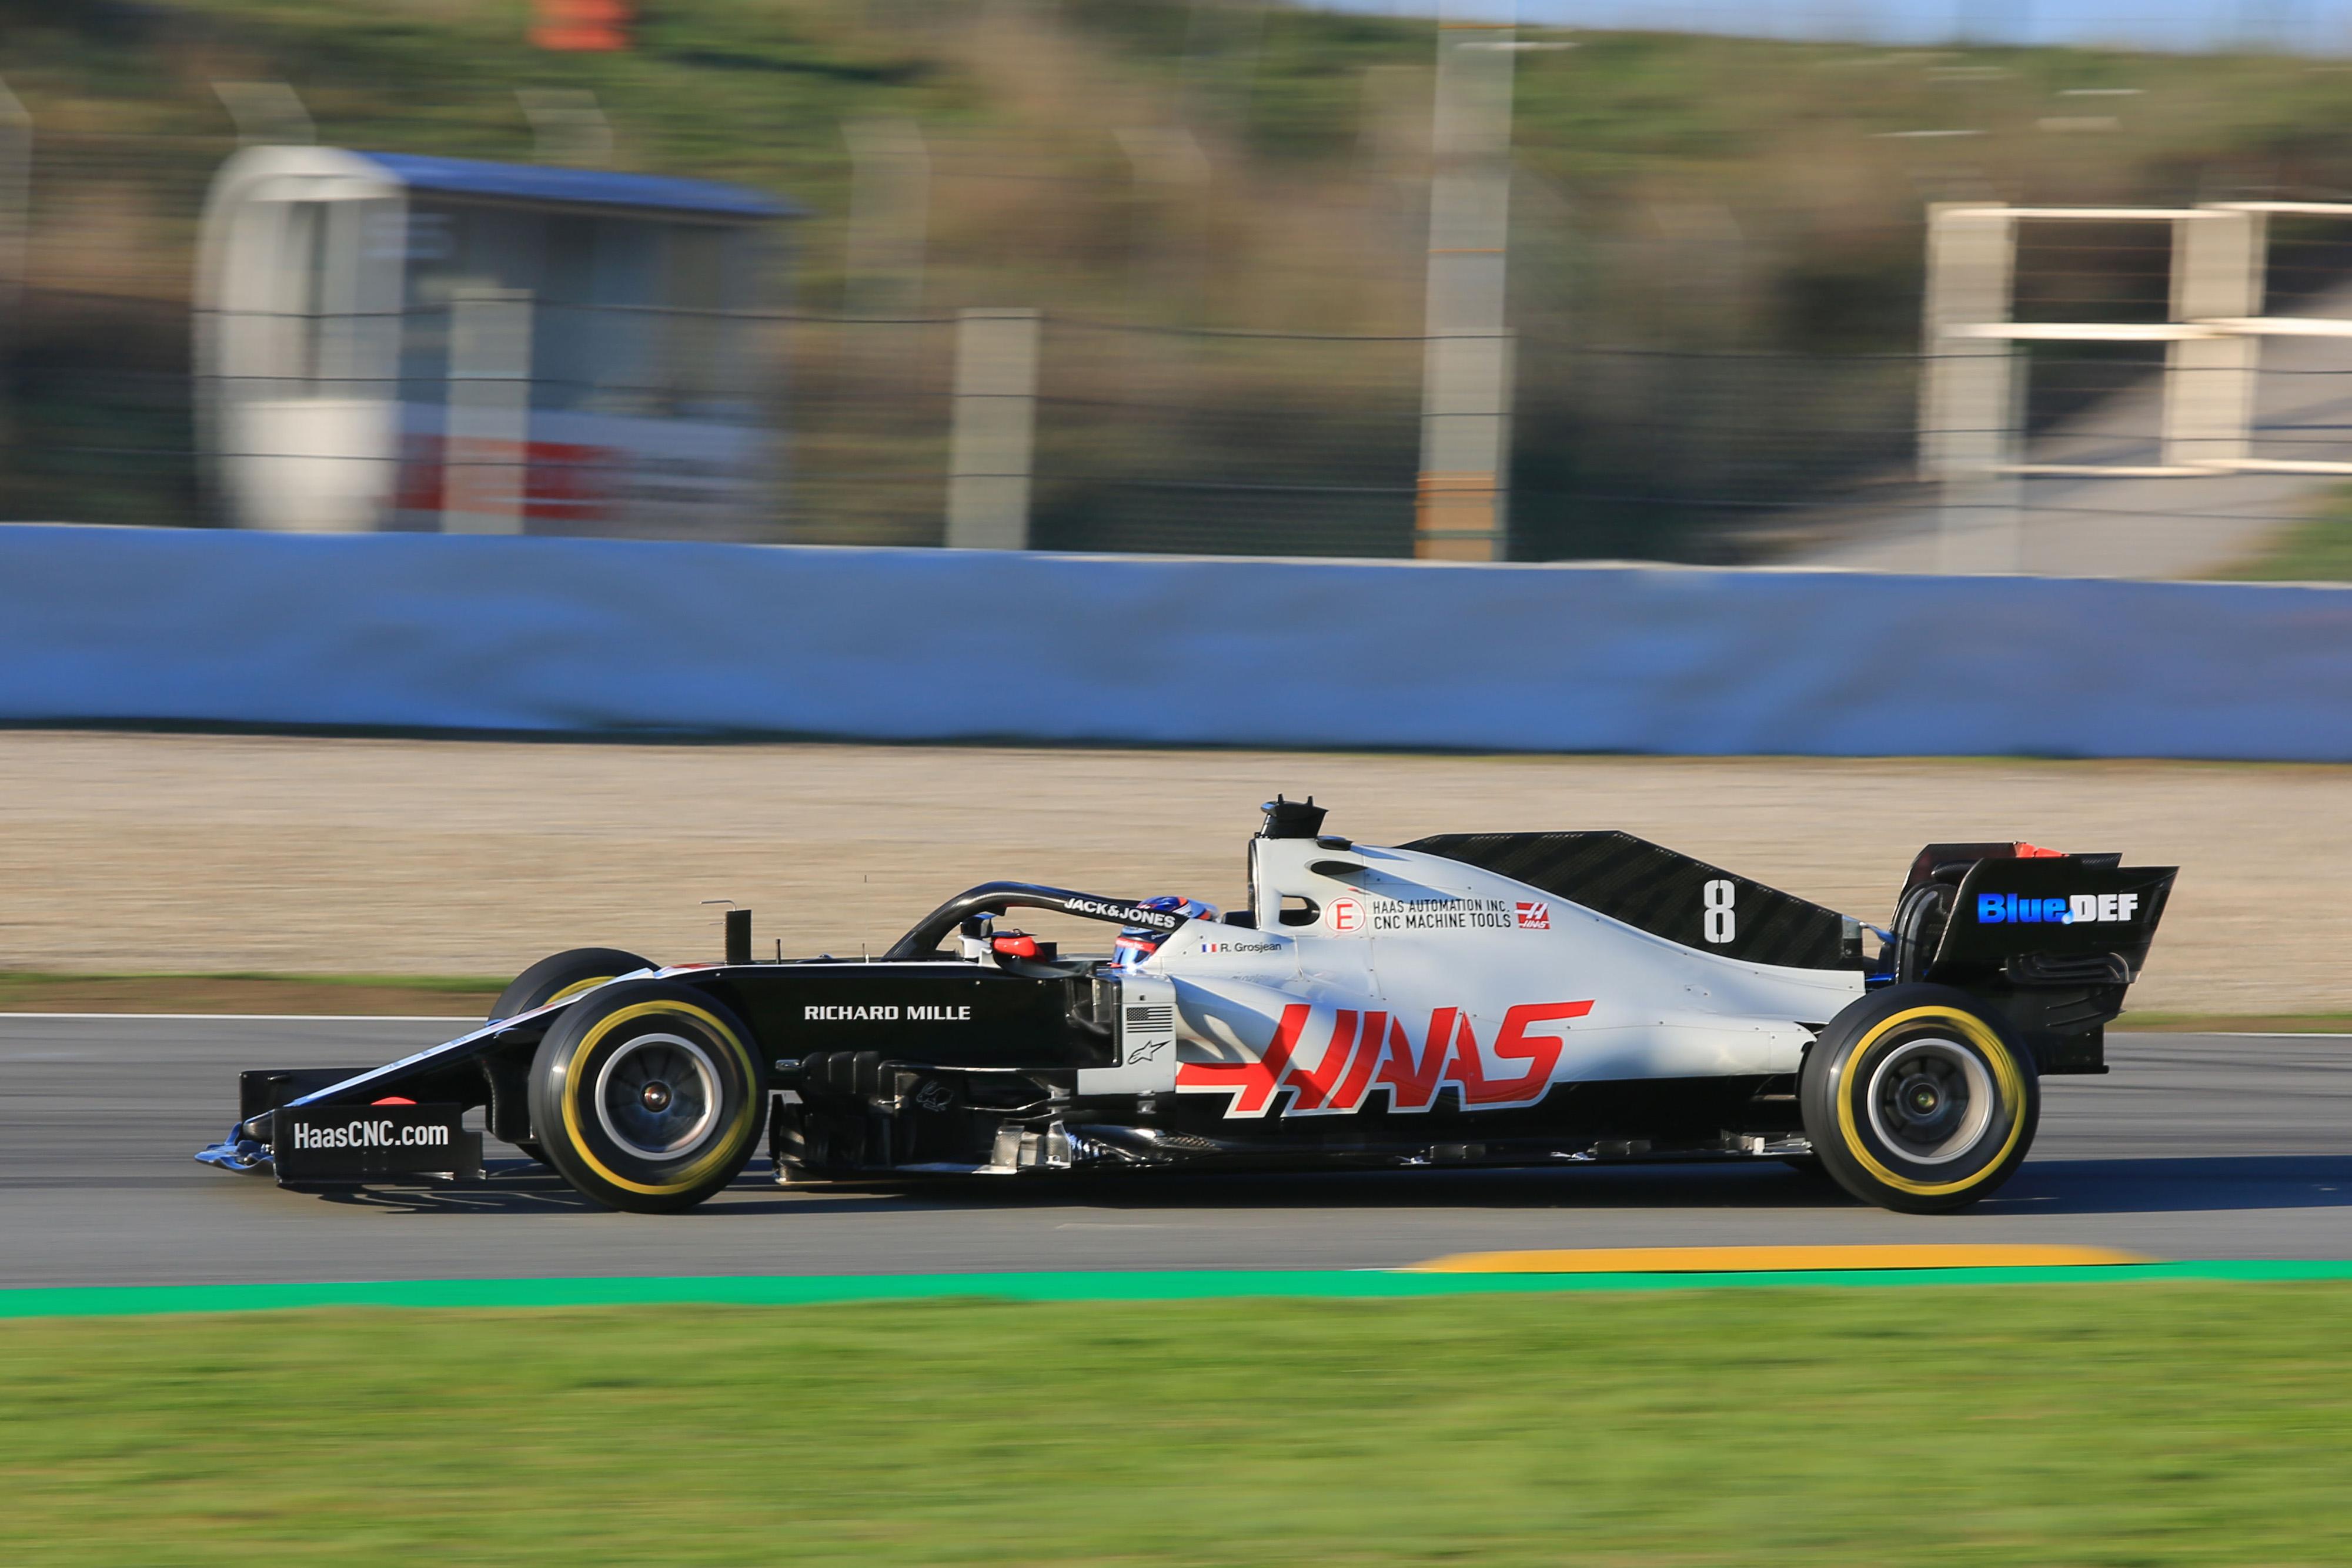 F1 Formula 1 Haas Kevin Magnussen VF20 car